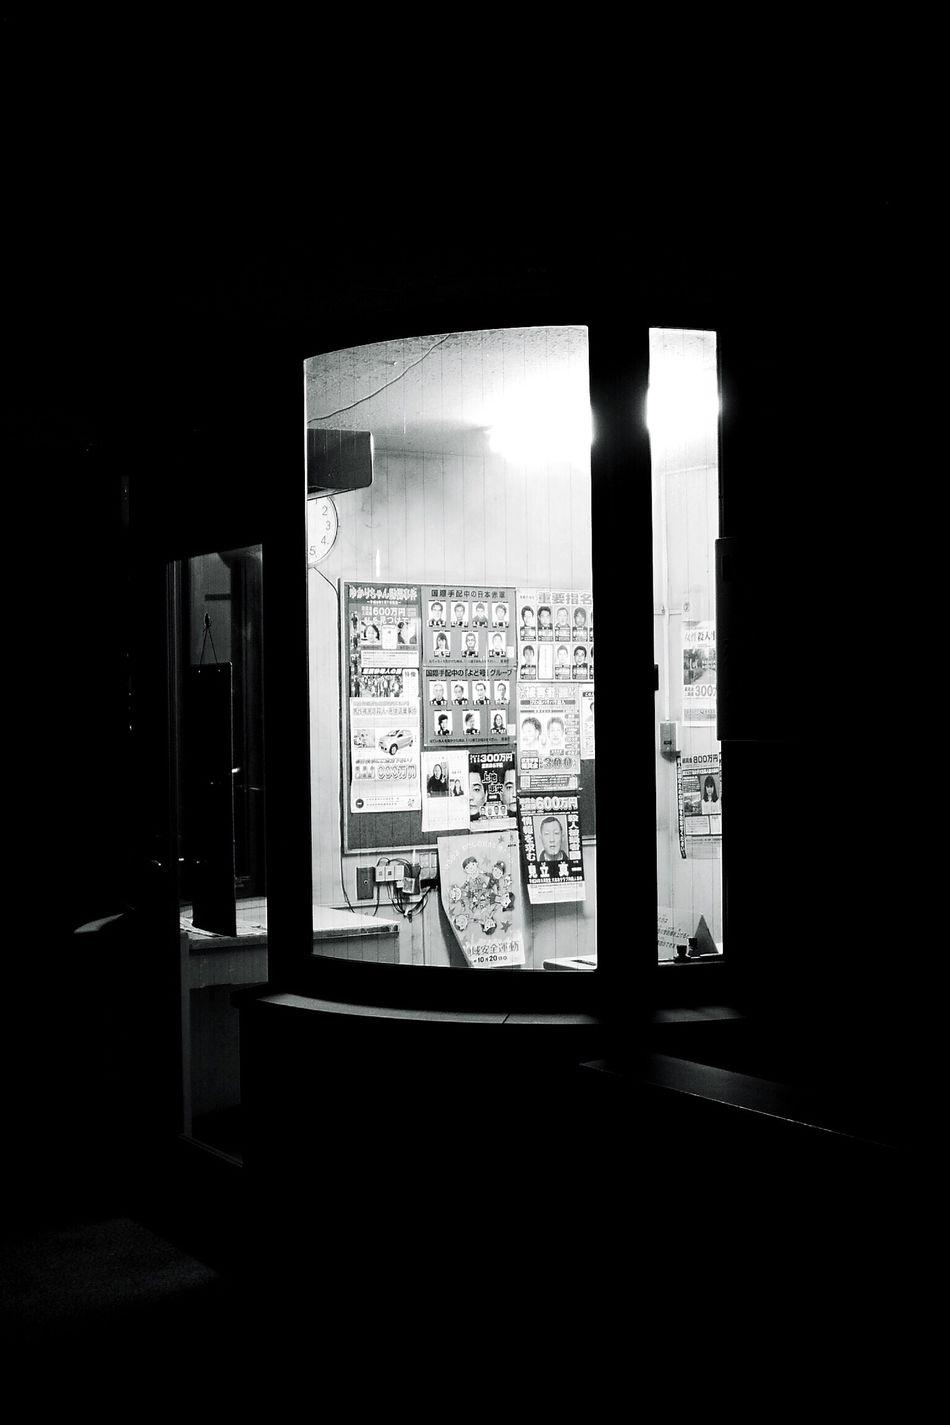 Learn & Shoot: After Dark Black And White B&w Photography EyeEm Best Shots - Black + White Monochrome Blackandwhite Black & White Japanese  Japan Japan Photography Tokyo Japanese Style Japanese Culture EyeEm Japan Night Night Photography Street Photography Streetphotography Black And White Photography Streetphoto_bw Police Koban Japan's most wanted